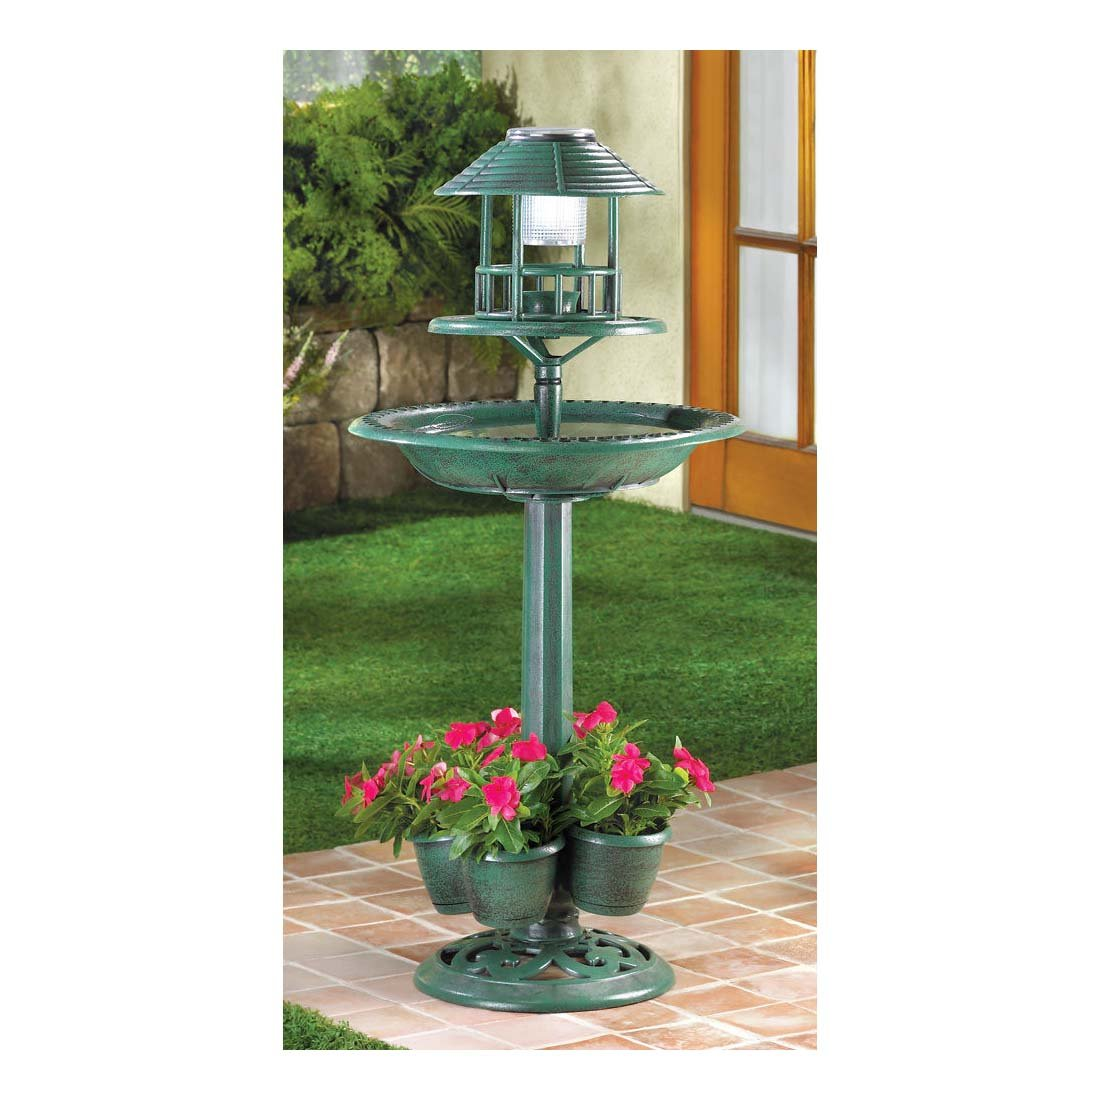 3 in1 SOLAR LED light plastic bird bath Bird feeder plant stand flower planter -17'' diameter x 36½'' high